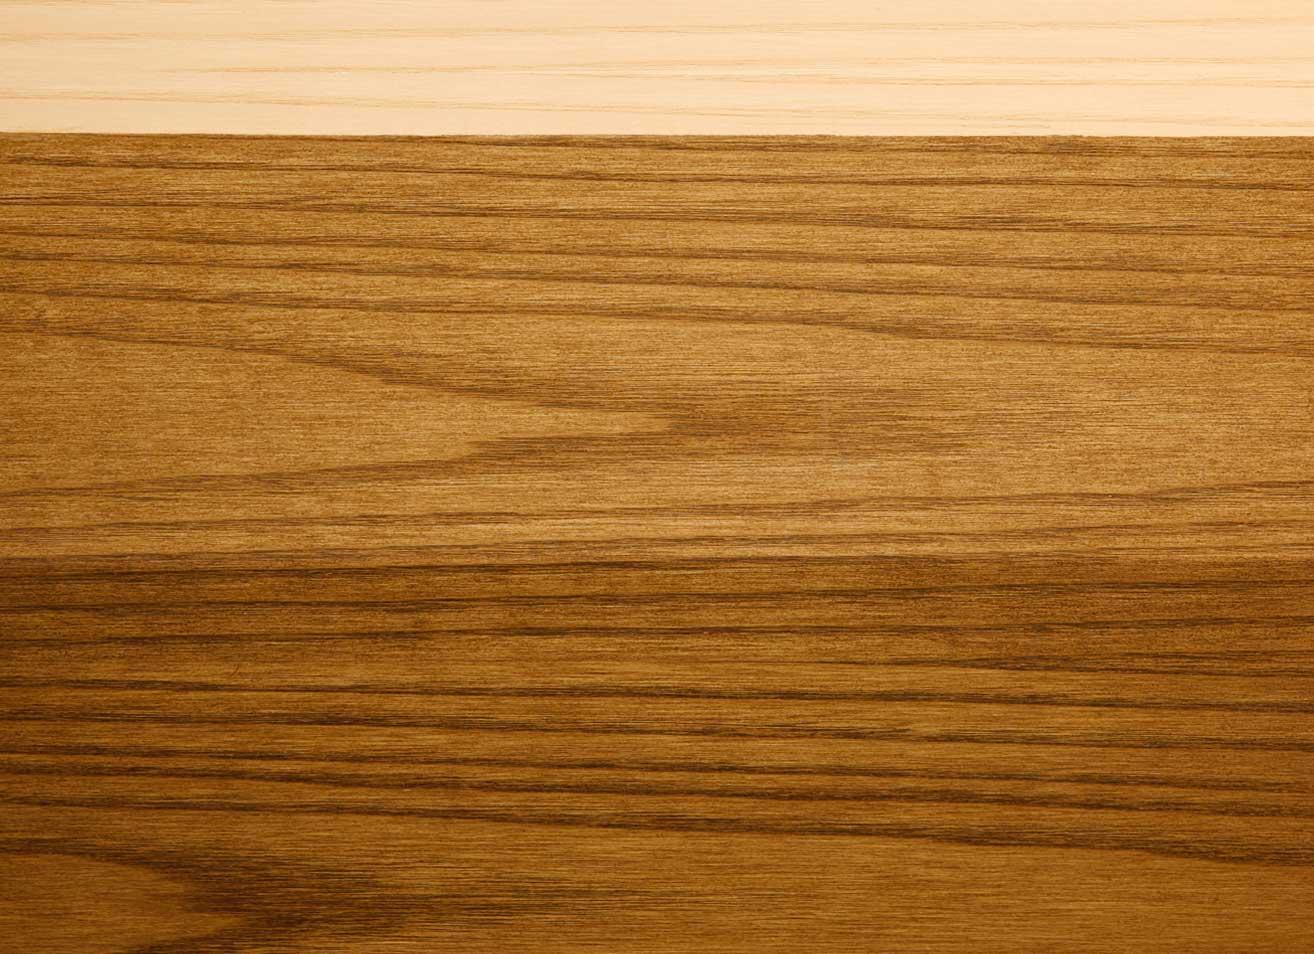 Acabado para madera poro abierto pintar - Color madera roble ...